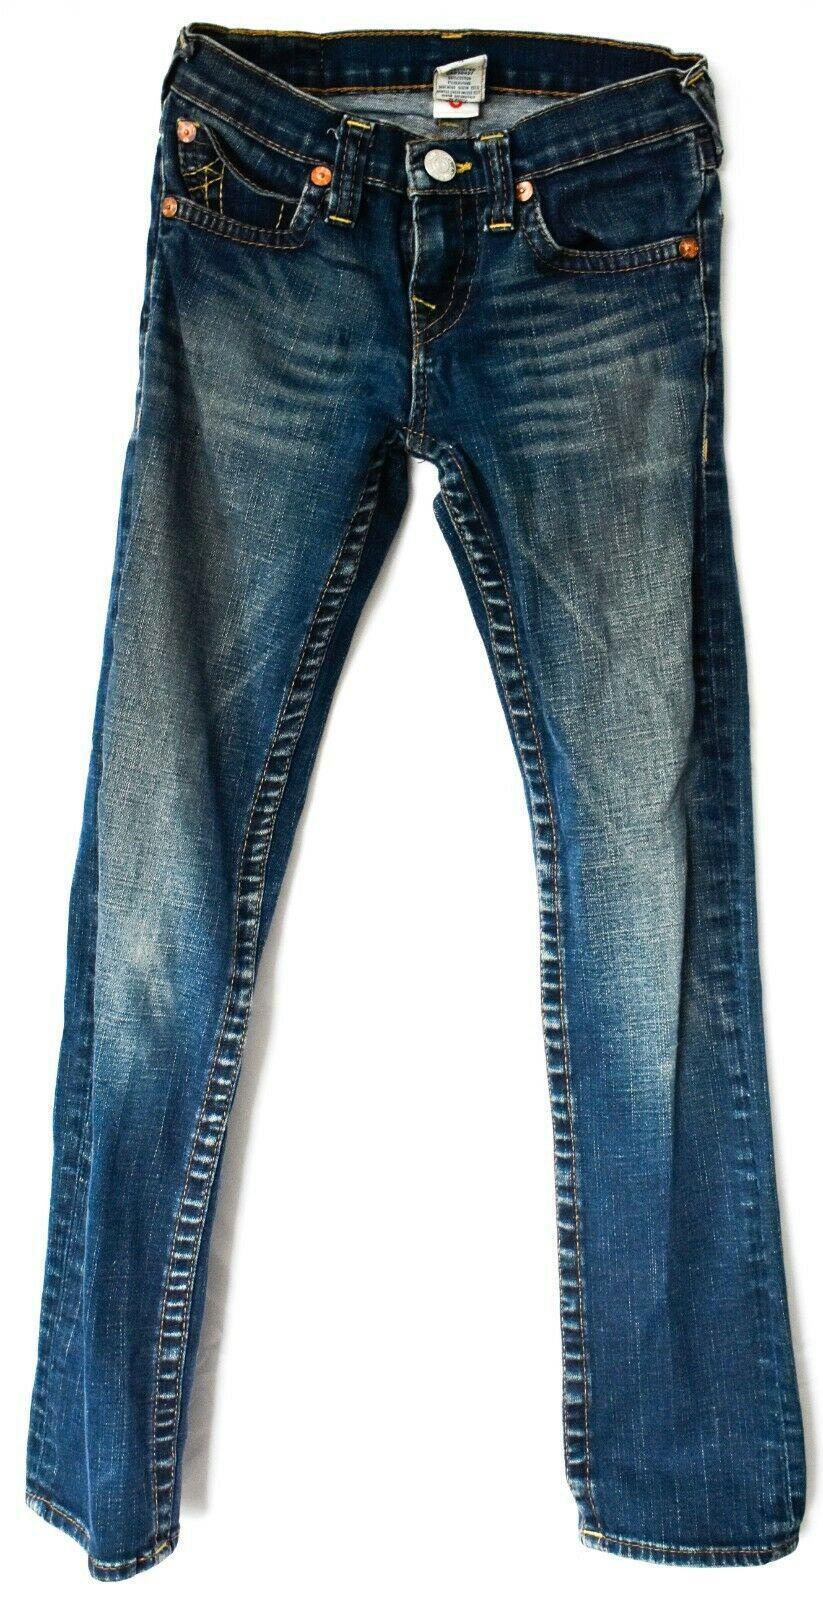 True Religion Girls Juniors Denim Straight Leg Blue Jeans Size 12 G102172QZ